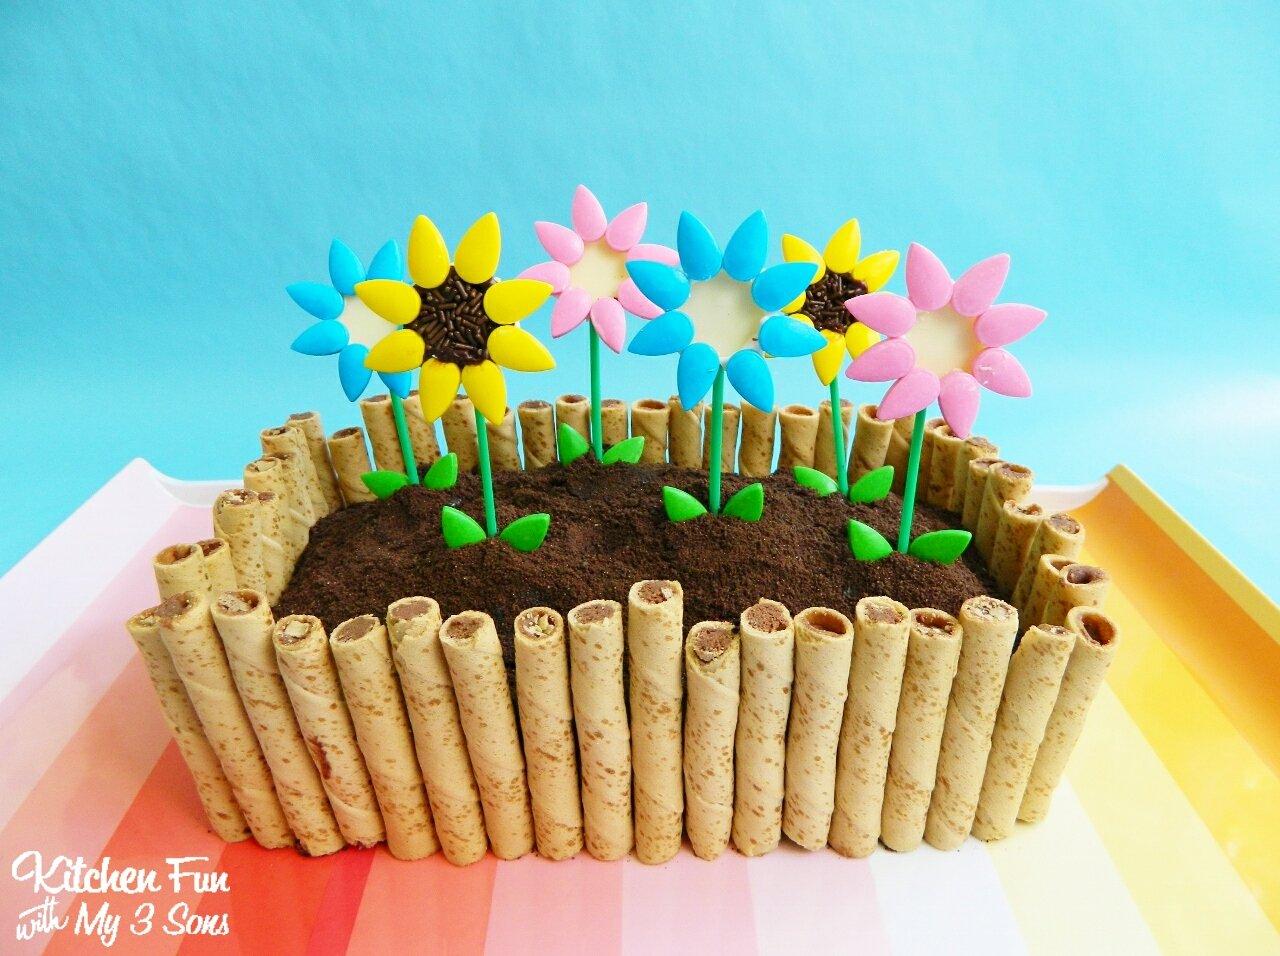 How To Make Pillsbury Cake Mix At Home